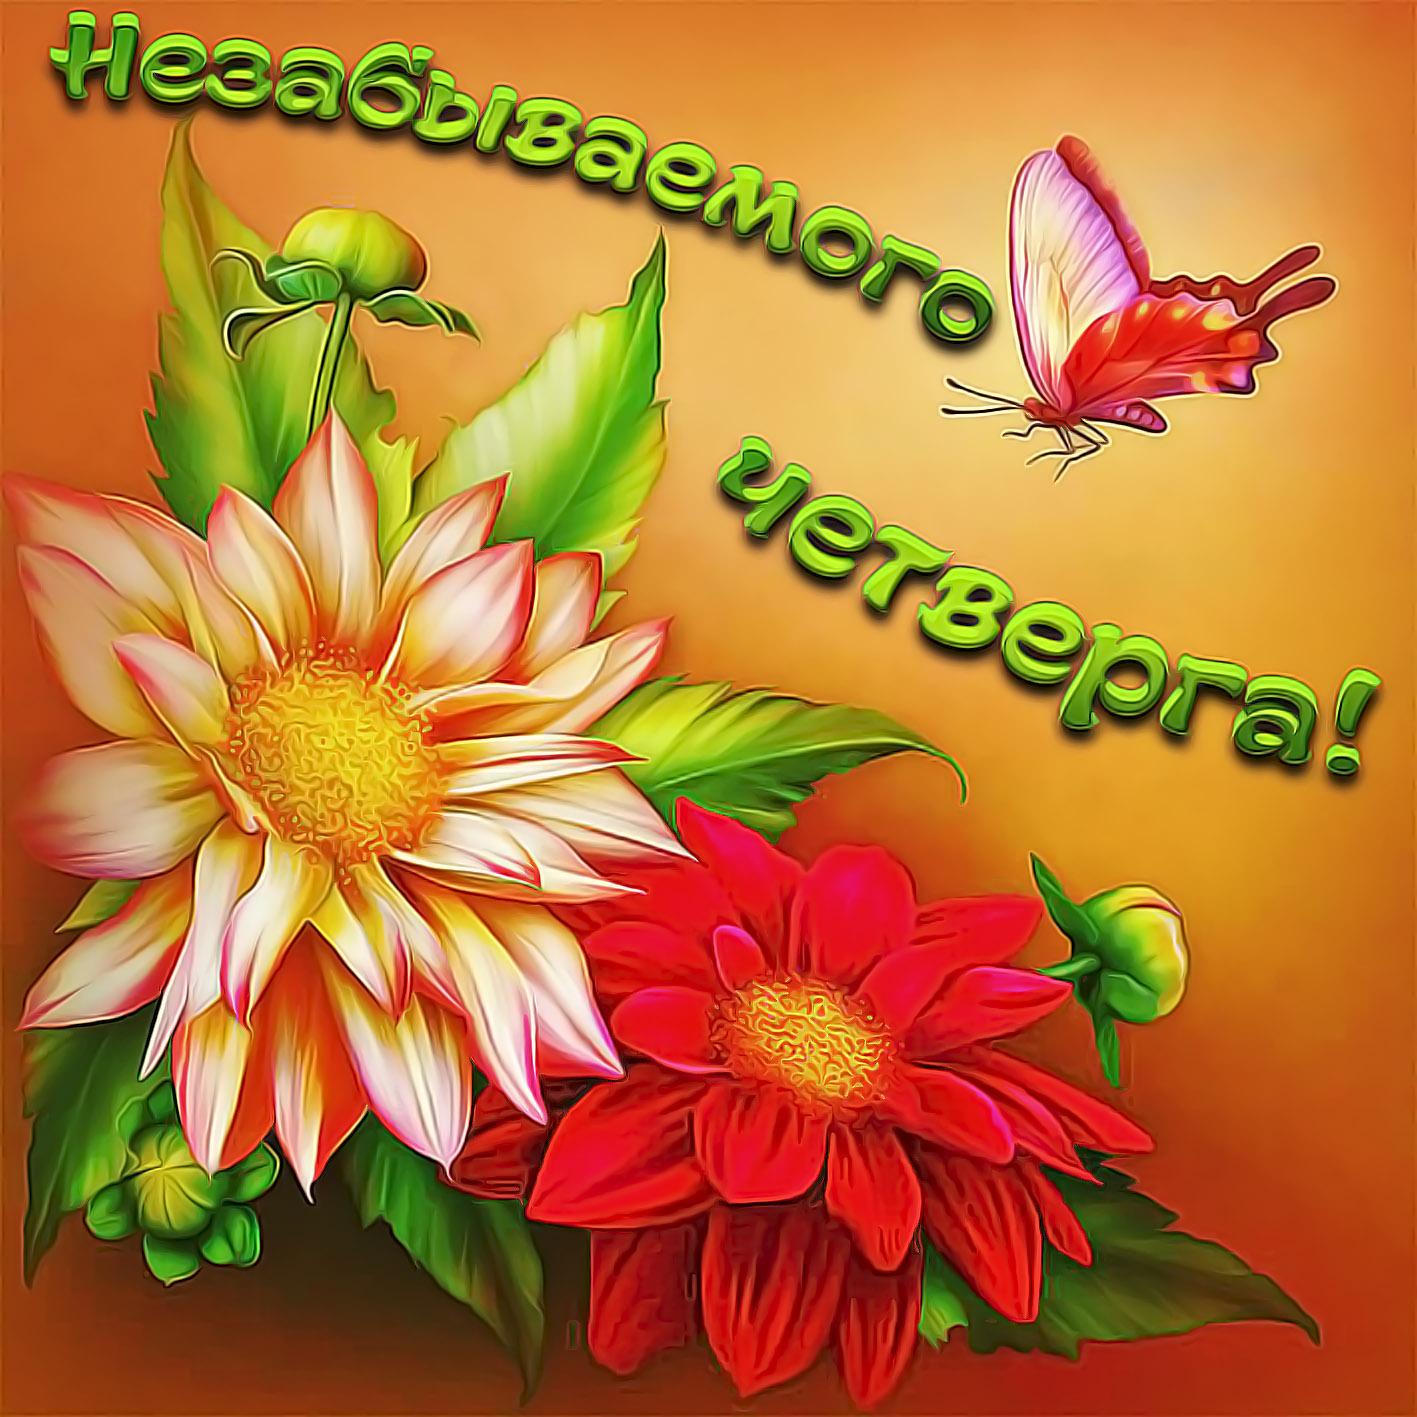 Картинка с красивыми, яркими цветами на четверг